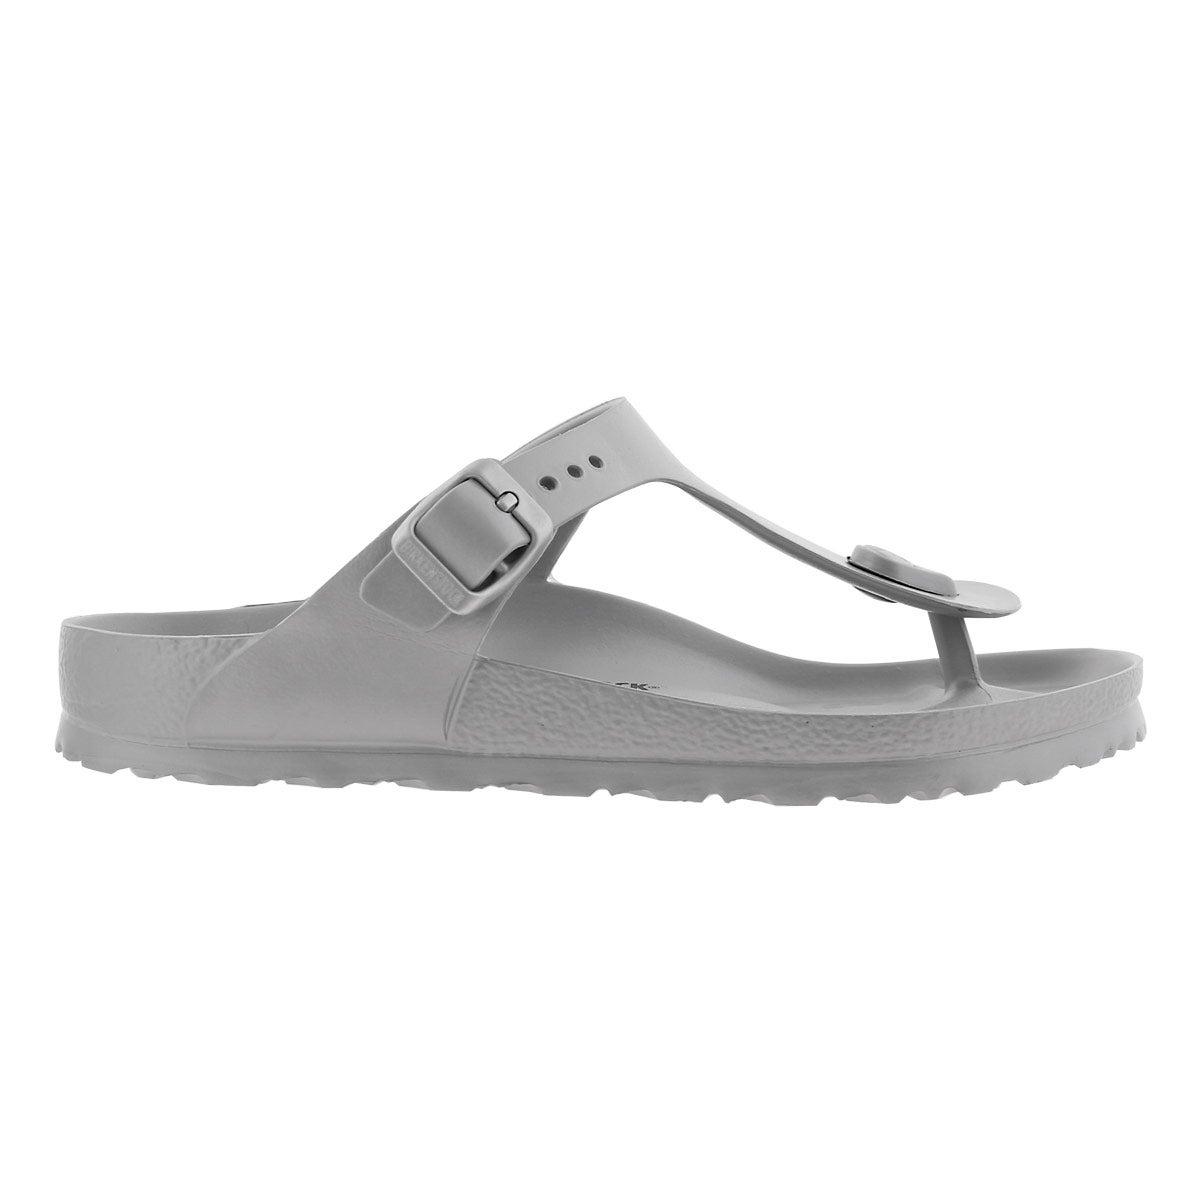 Lds Gizeh EVA metallic slvr thong sandal